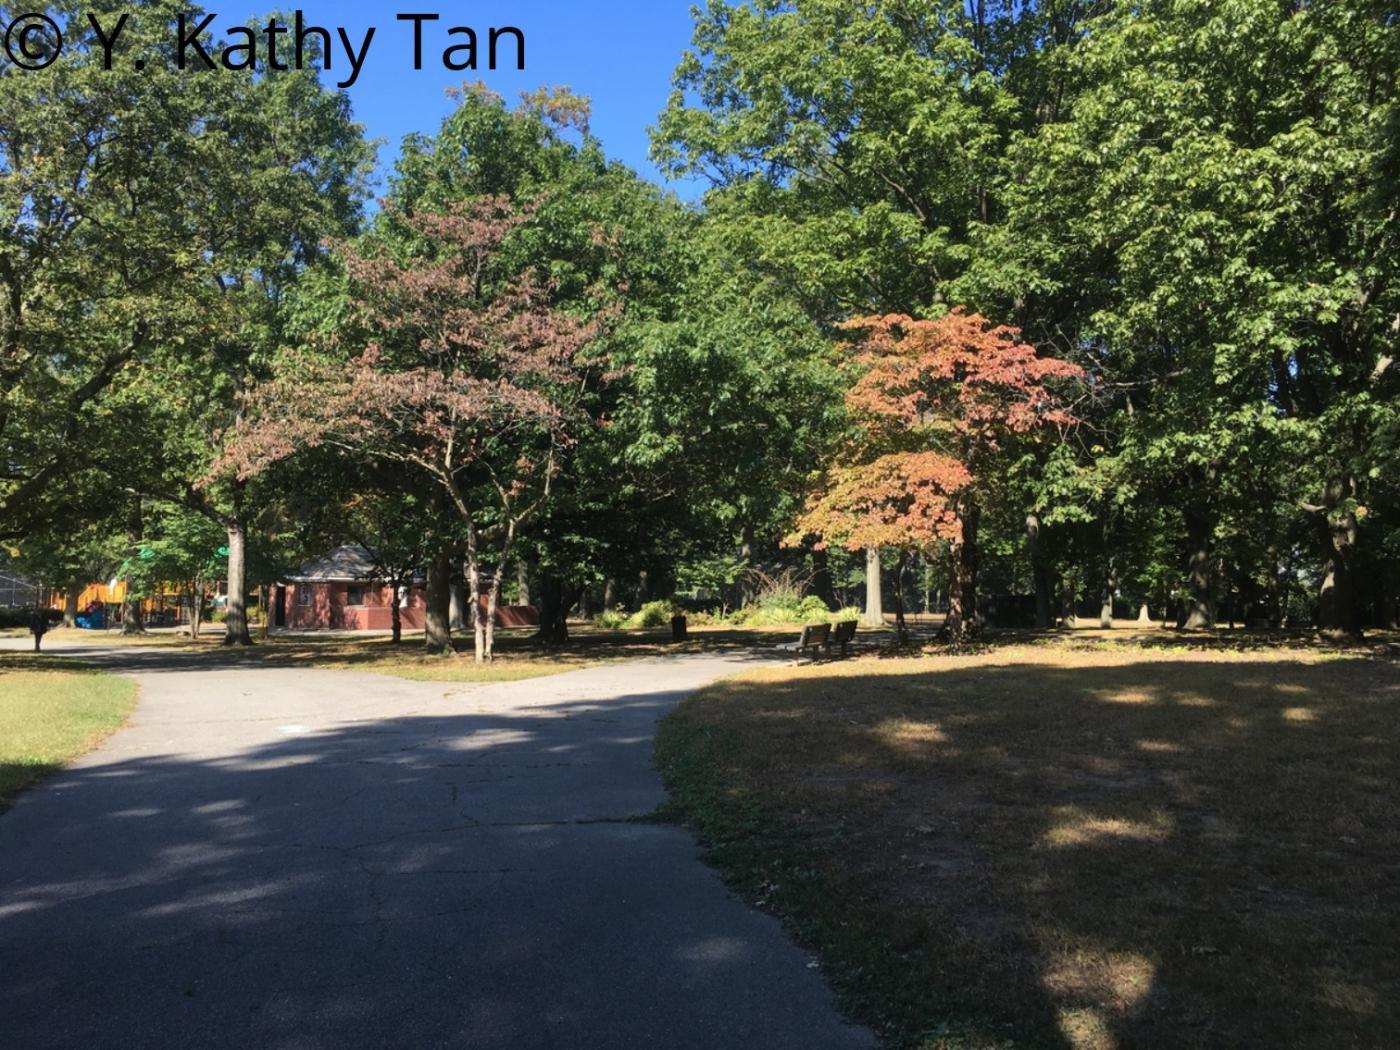 Alley Pond 公园的初秋_图1-3